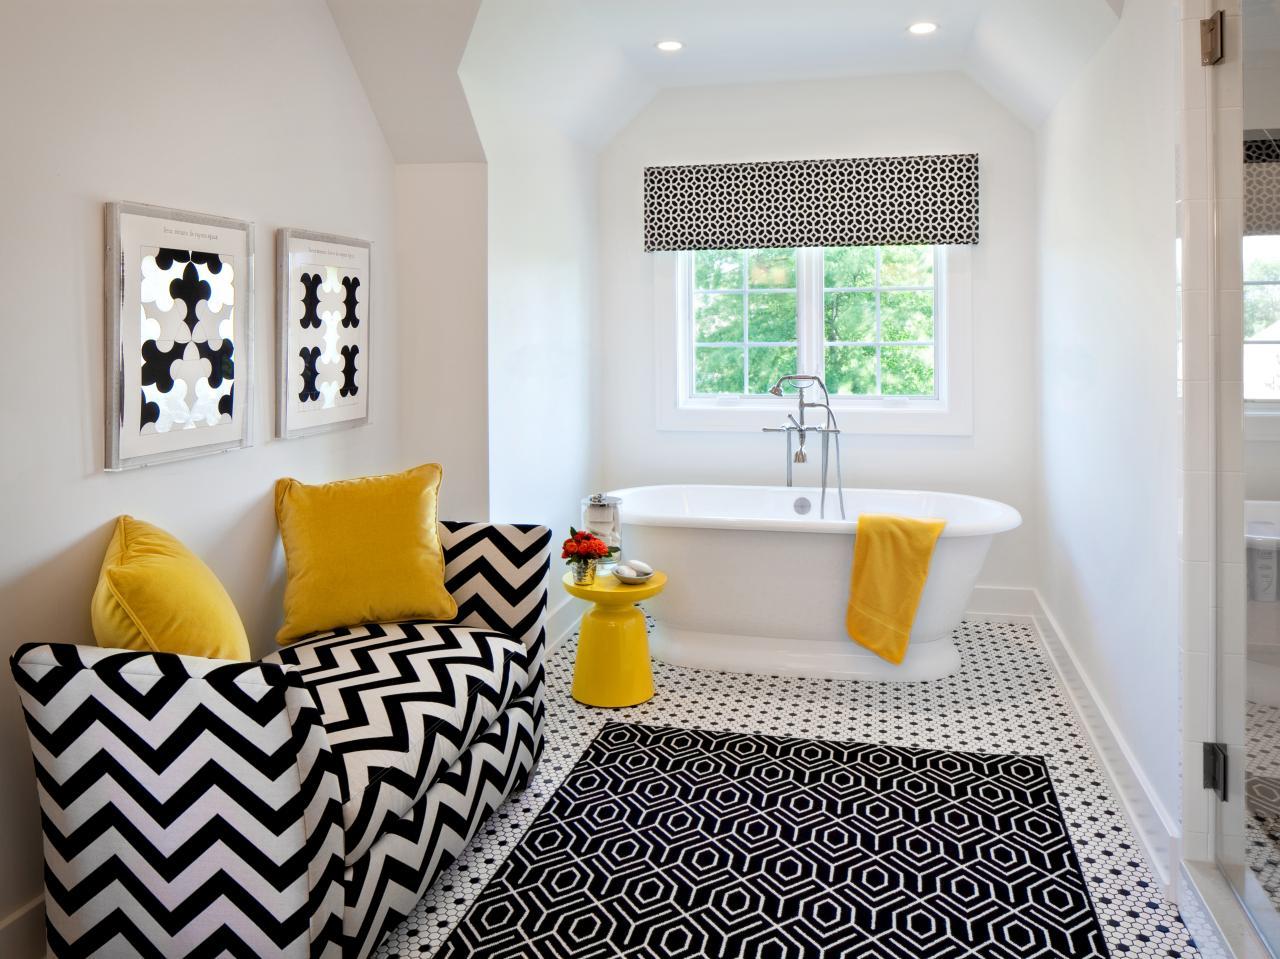 White opulence maison valentina2 black and white bathrooms Black and White Bathrooms of Spectacular Opulence Black and White opulence maison valentina4